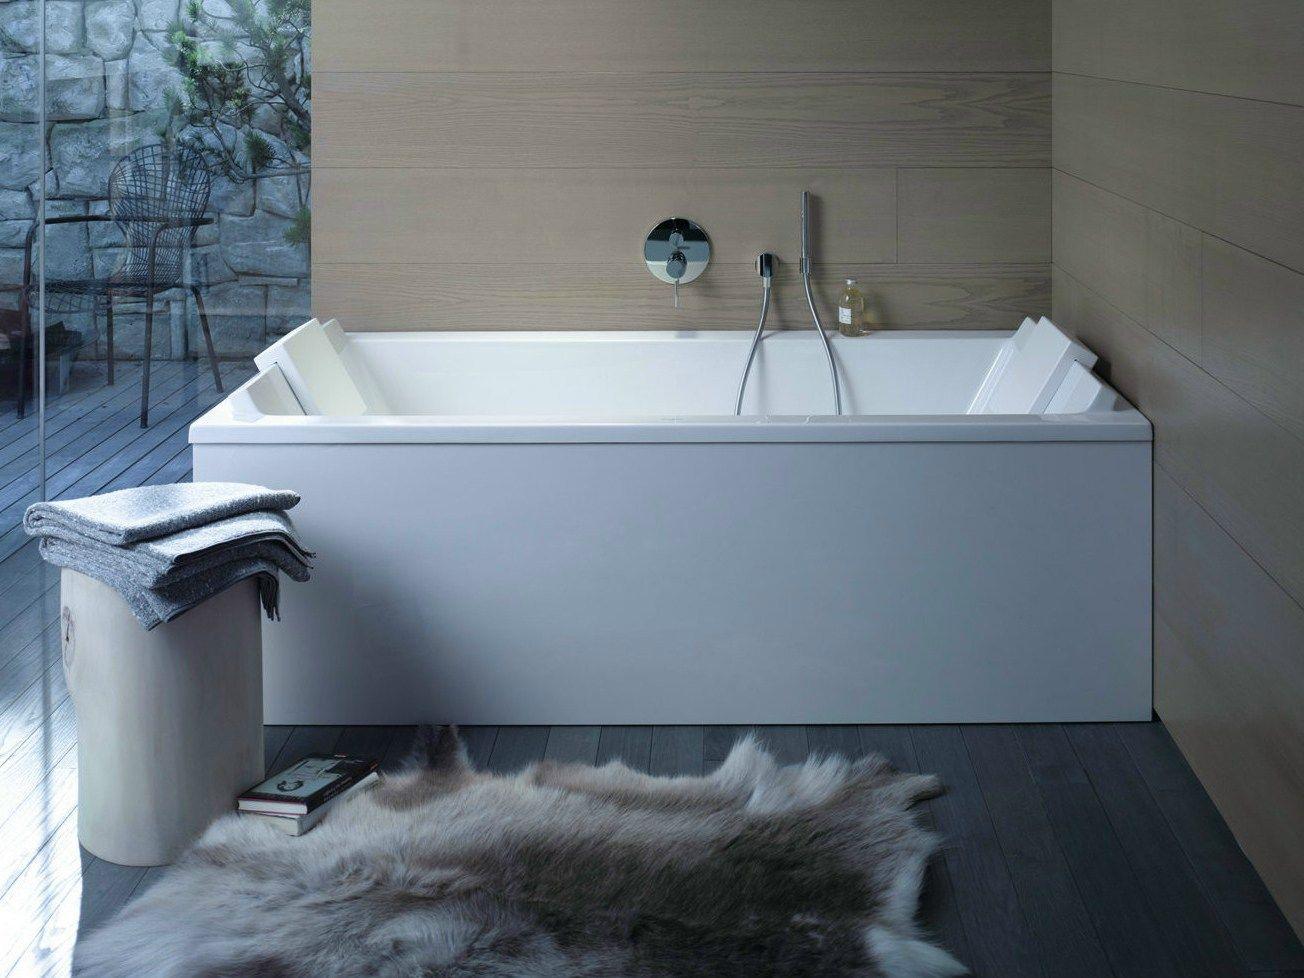 Starck vasca da bagno rettangolare by duravit design - Vasca acrilico ...